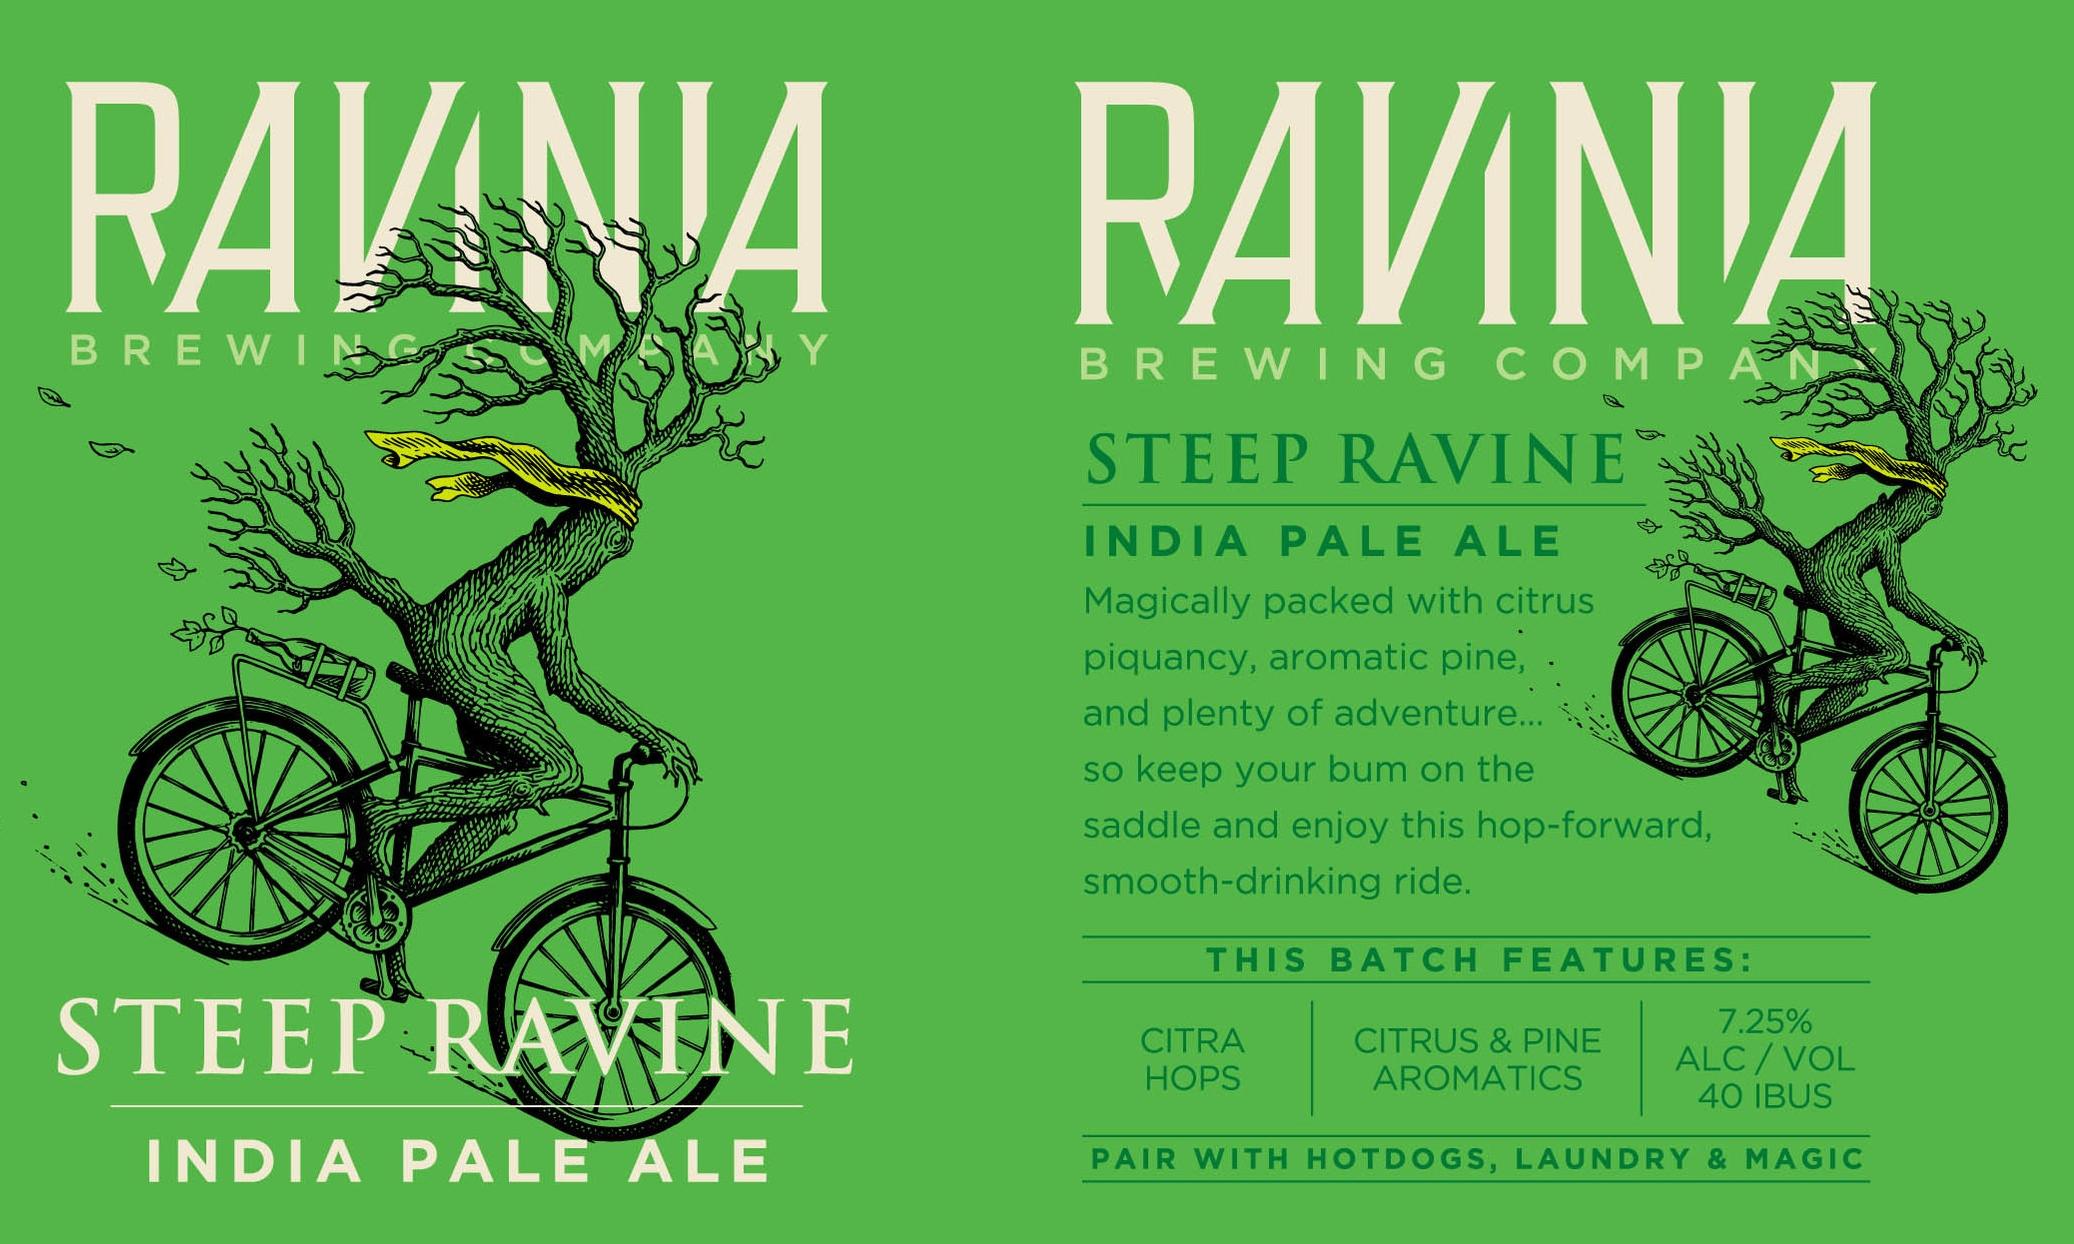 Ravinia Brewing_Poster_Steep Ravine.jpg